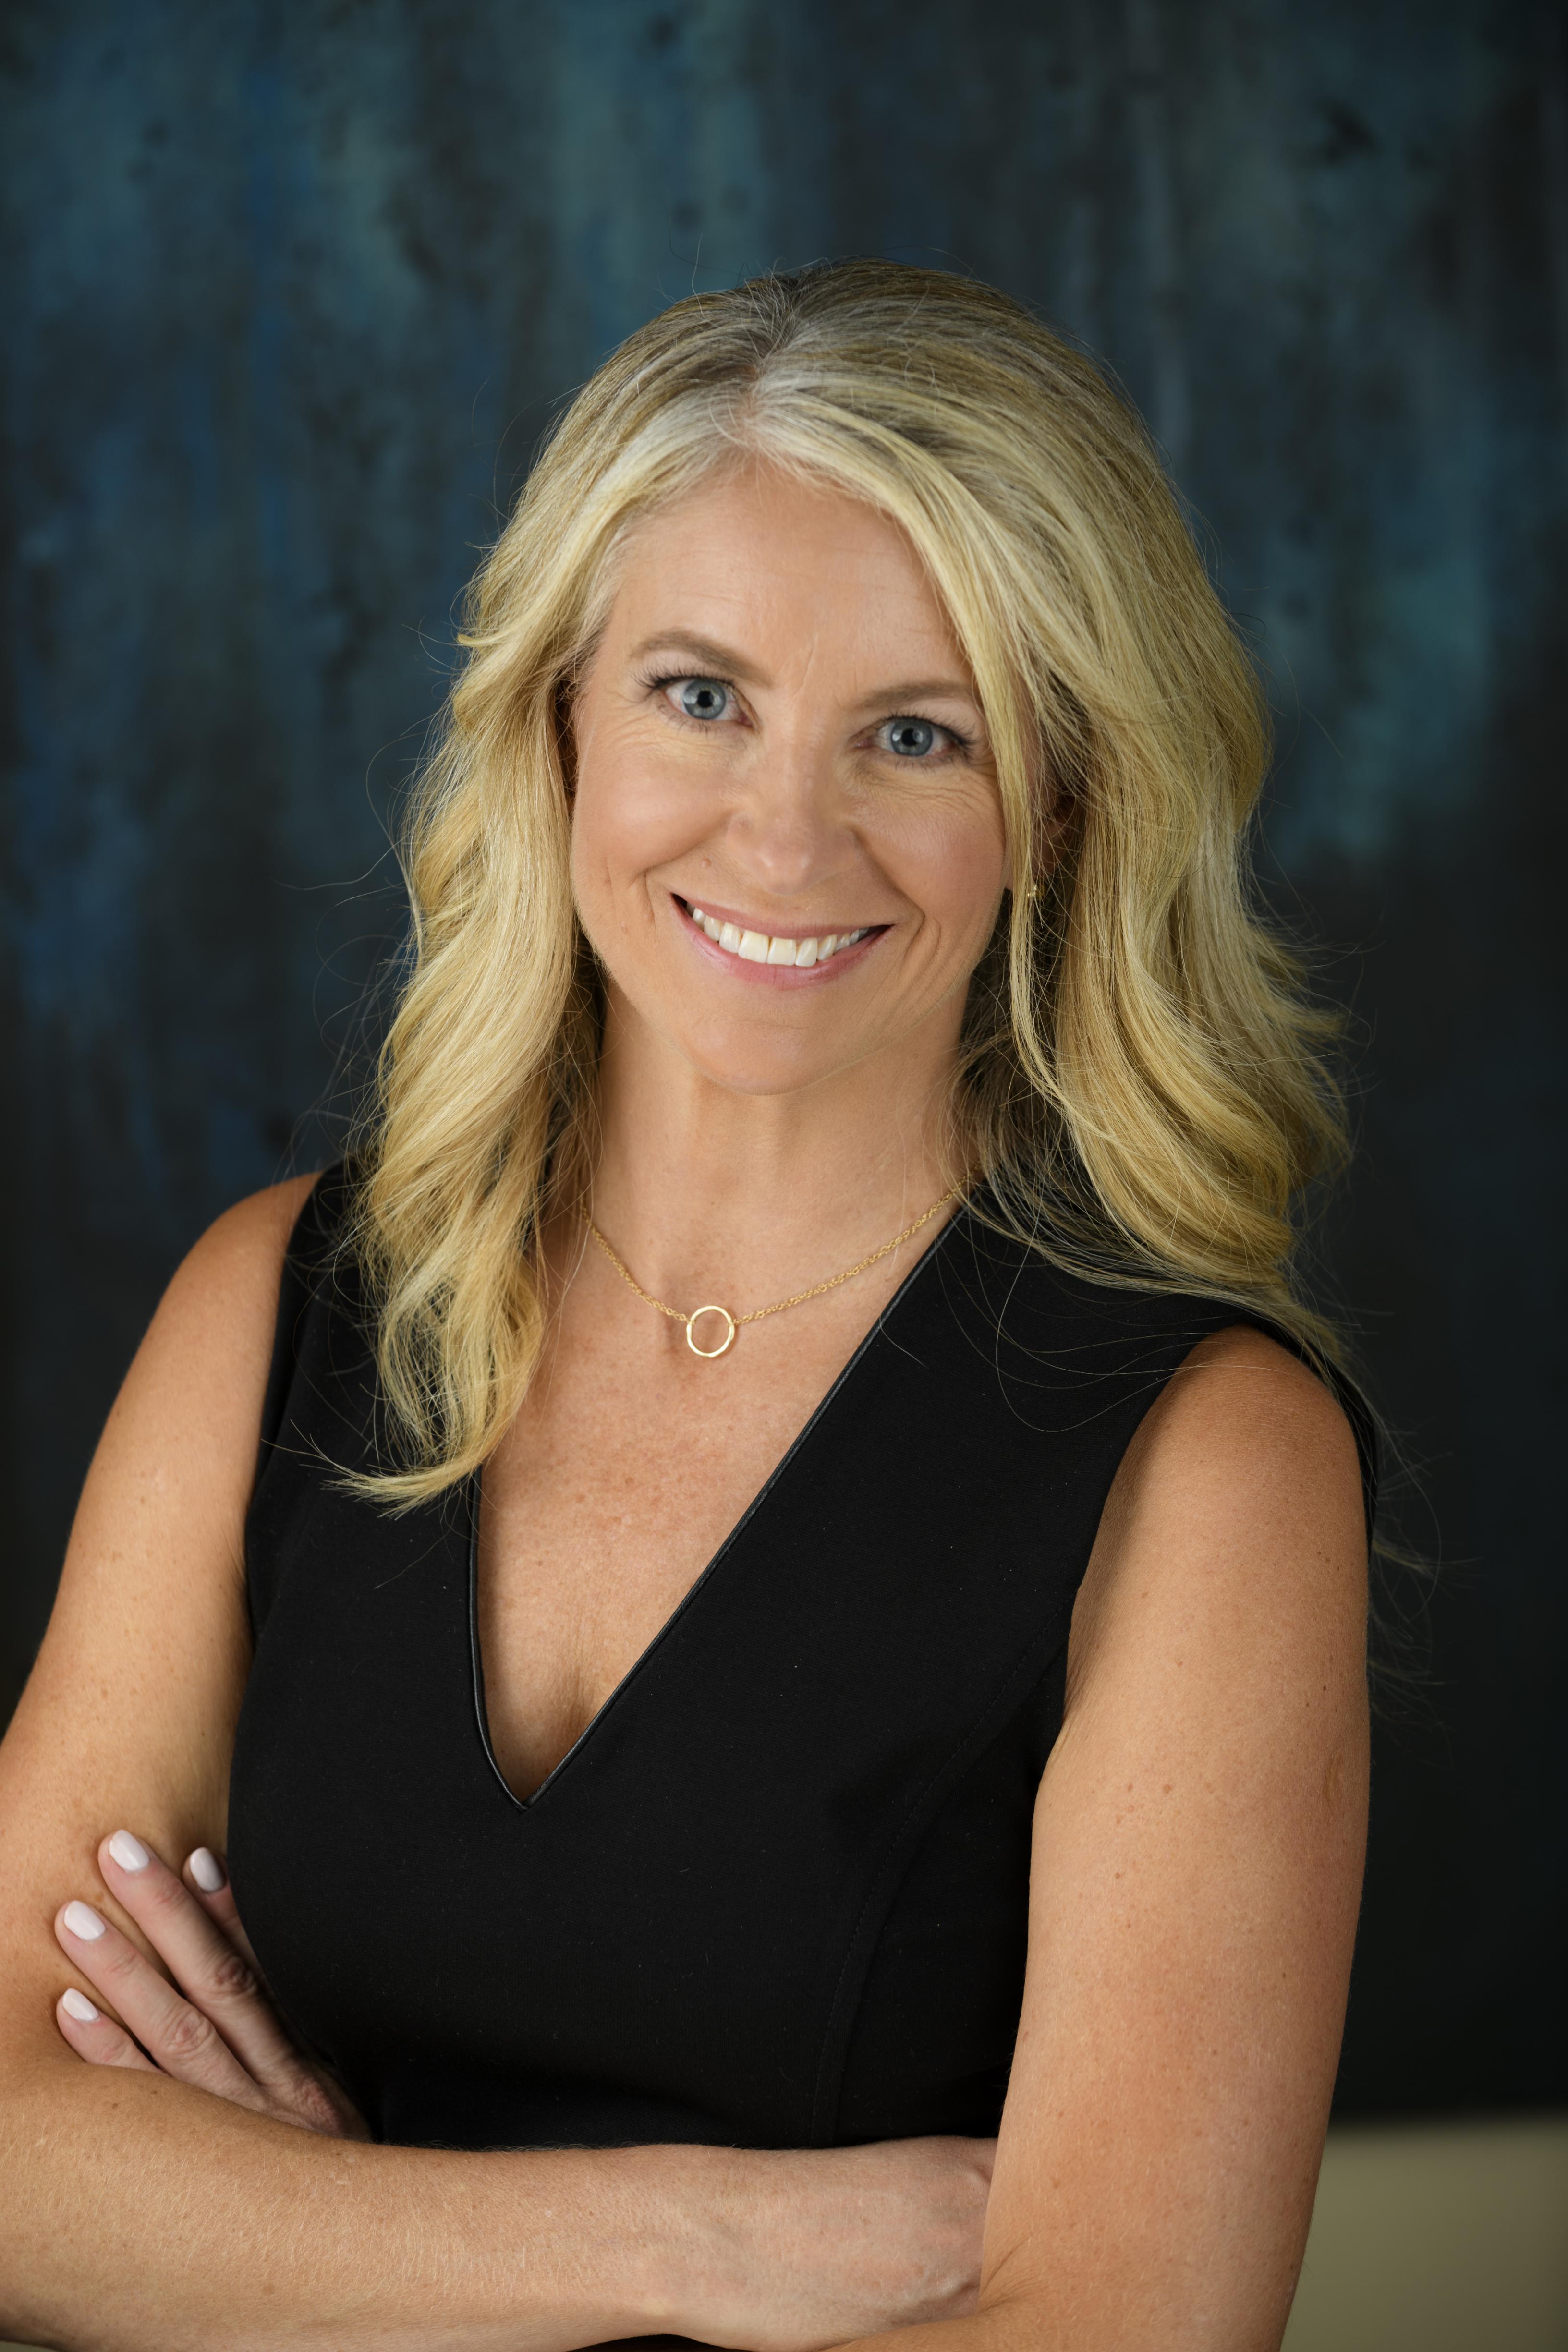 Nicole Teaney